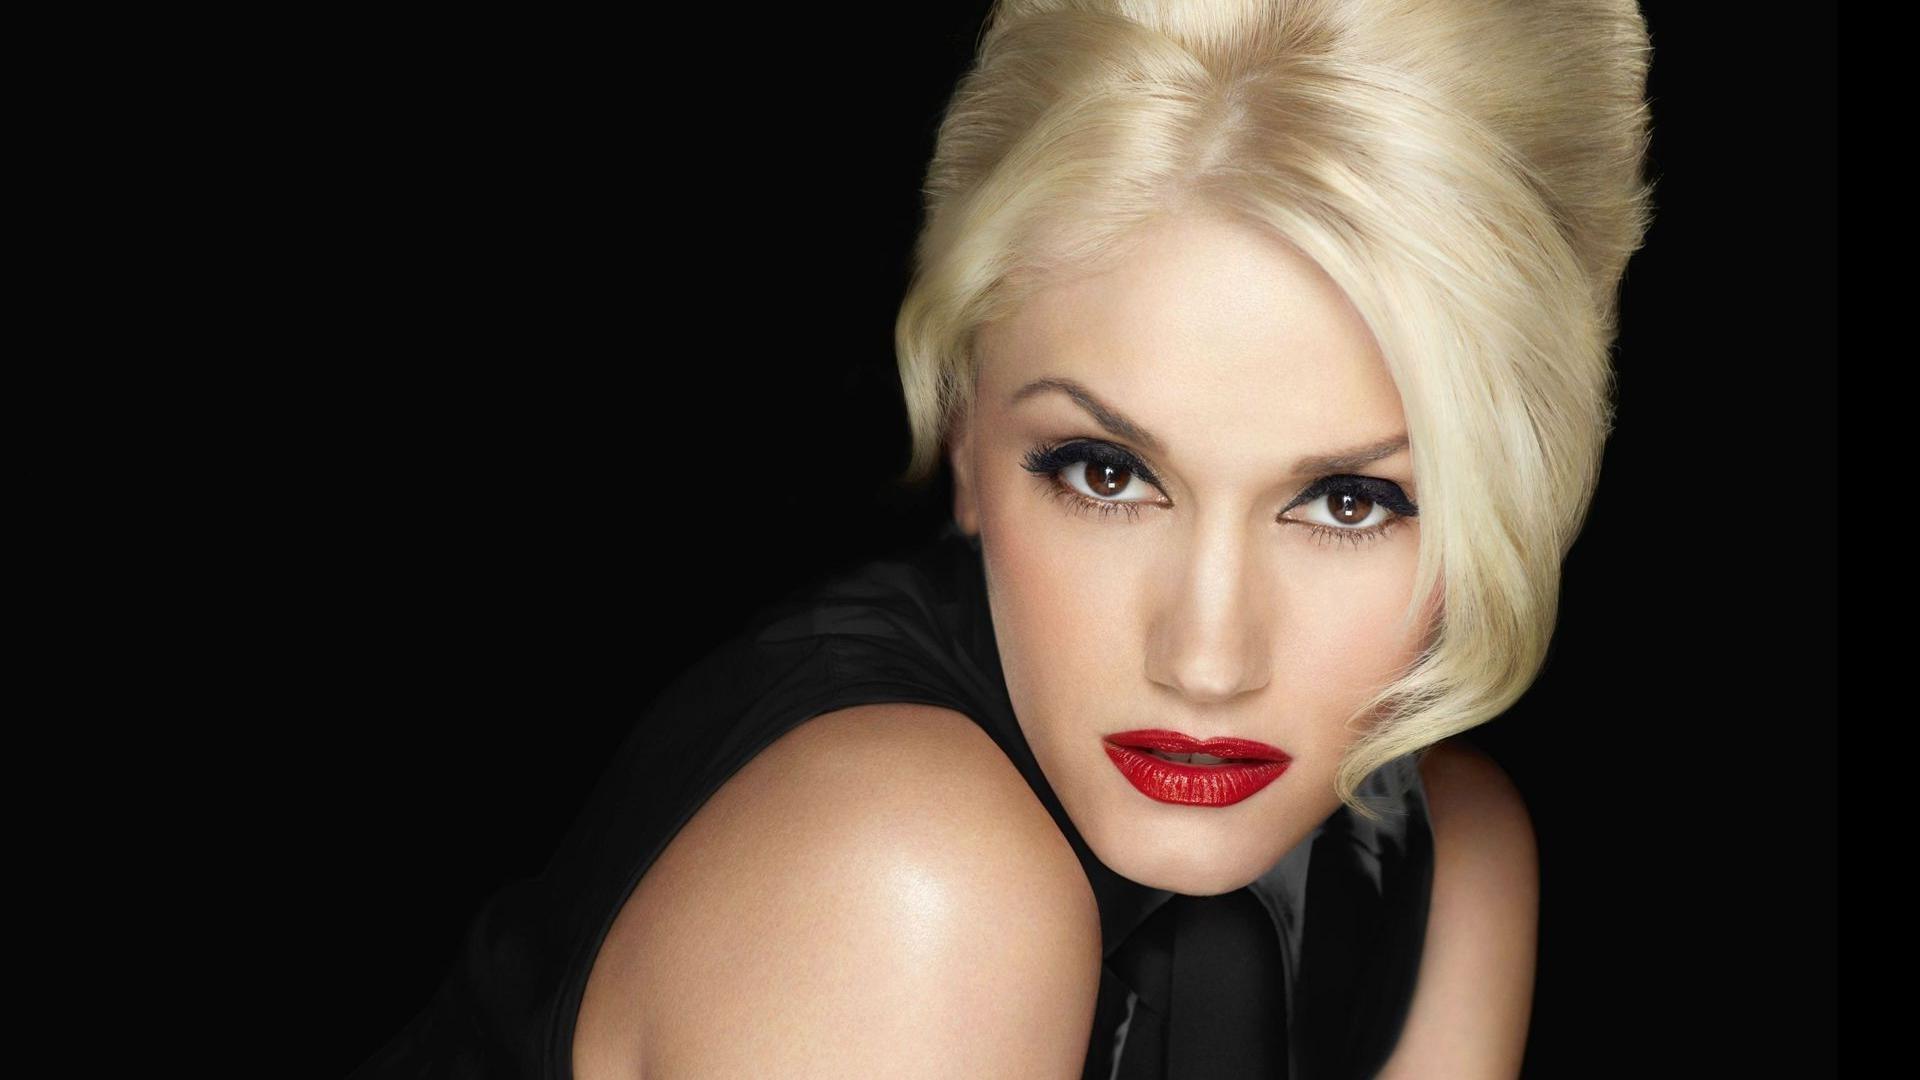 Gwen Stefani Christmas Cd.Gwen Stefani You Make It Feel Like Christmas Xmas Music